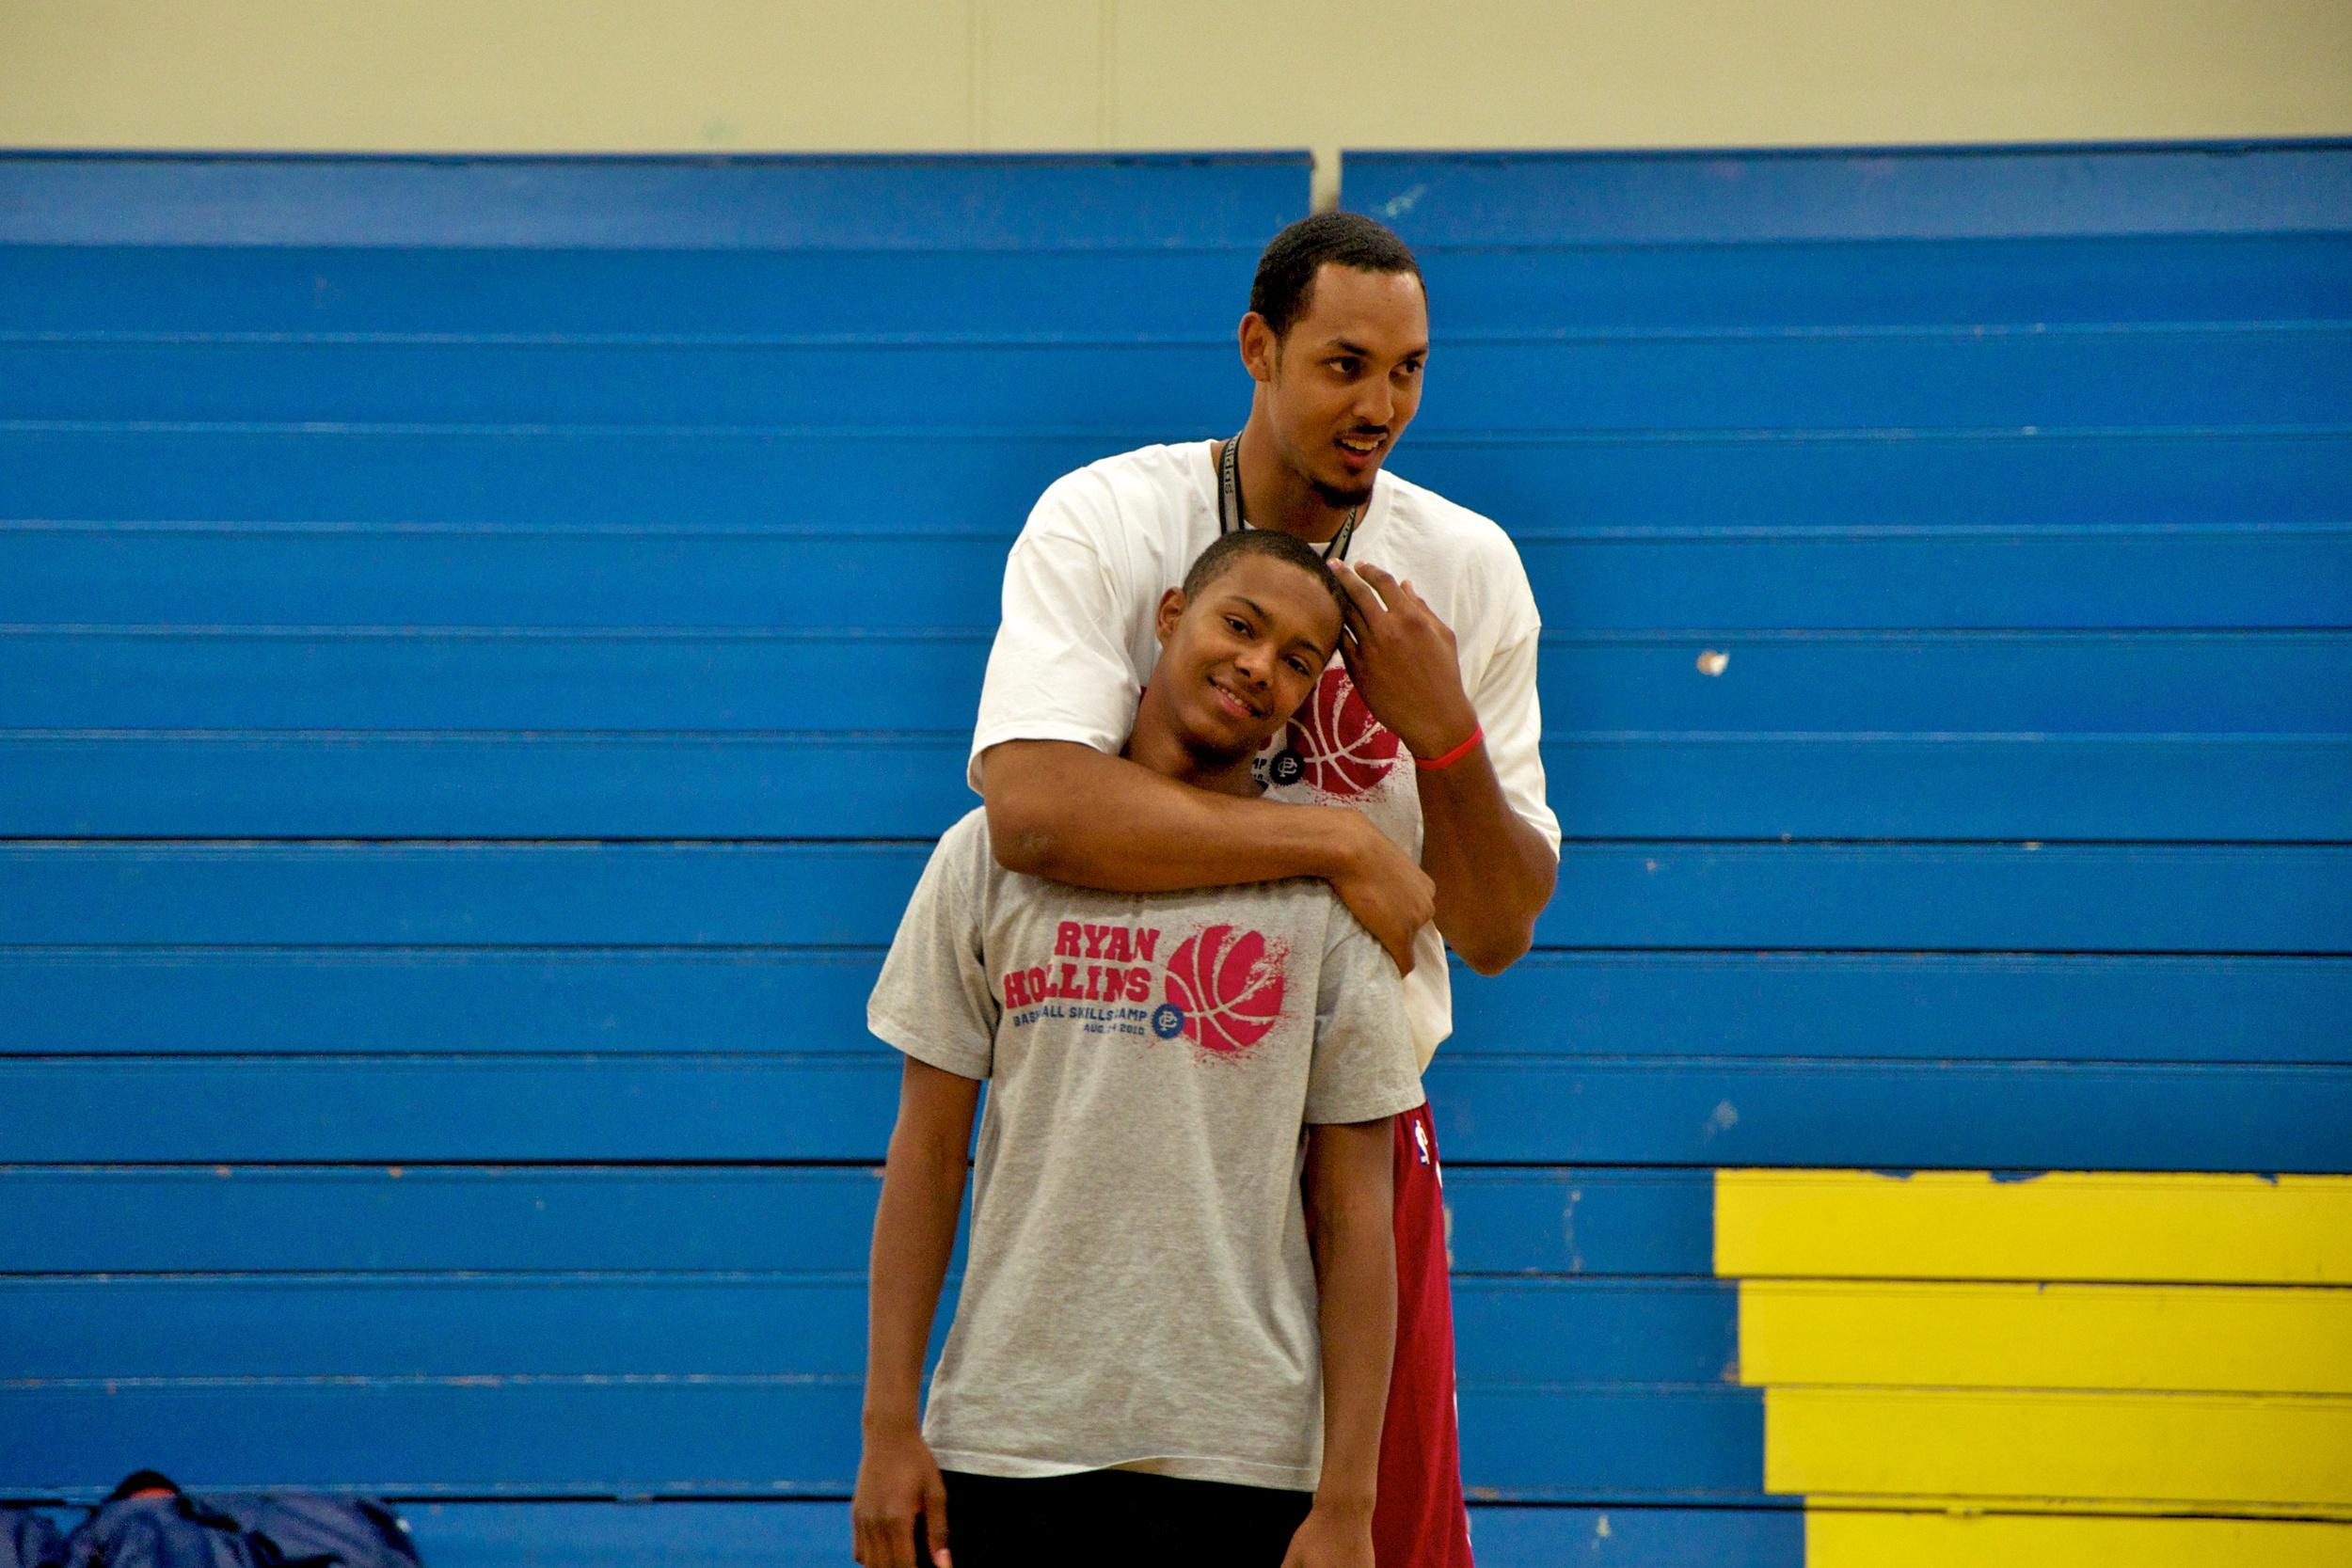 Ryan Hollins Basketball Camp 25.jpg